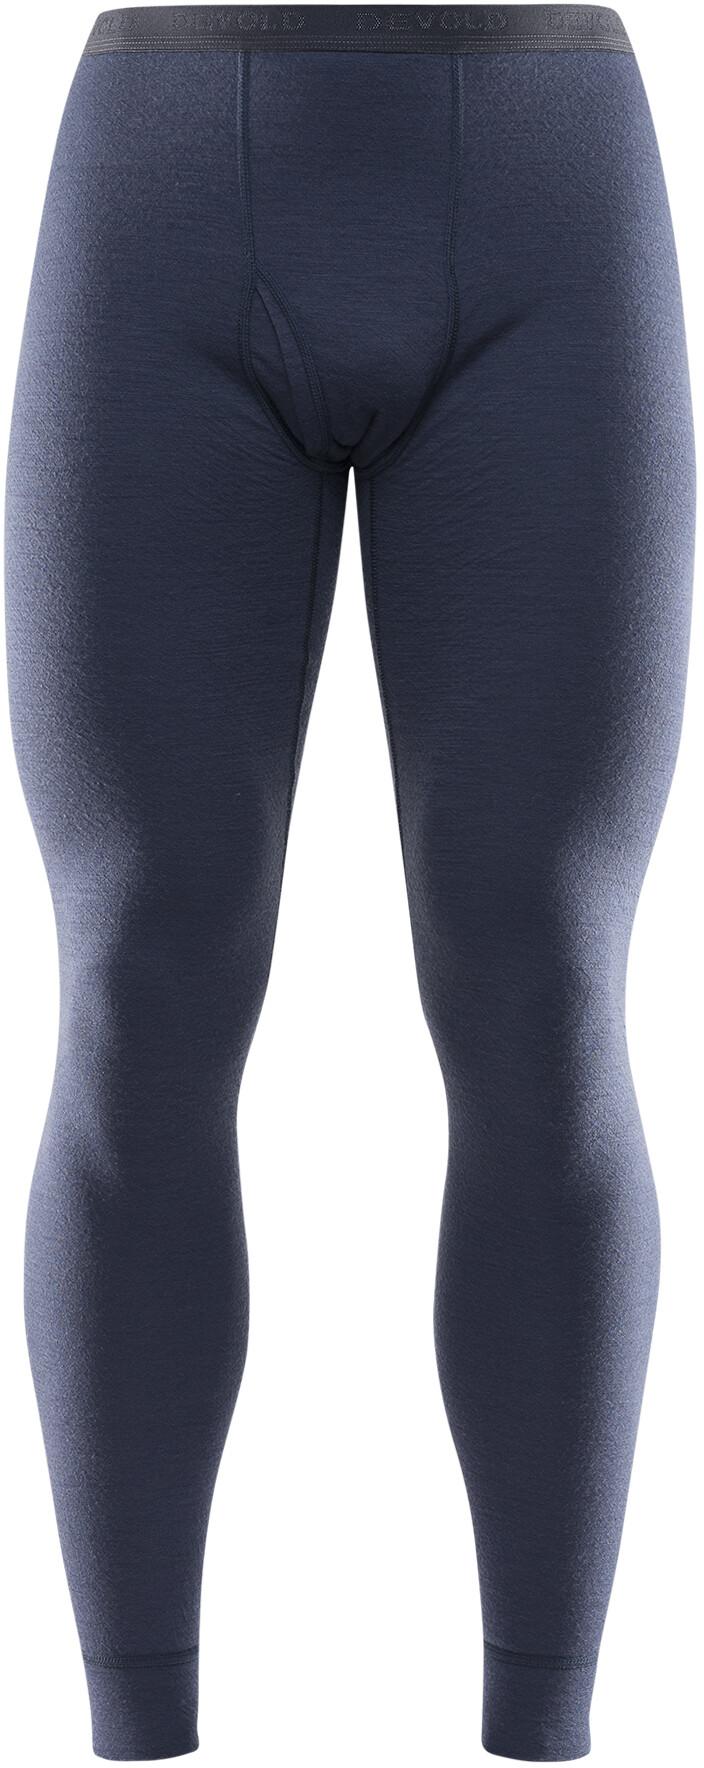 Puma Sesame Street Sweat Pants TR B Kids Trousers Black Tracksuit Bottoms New